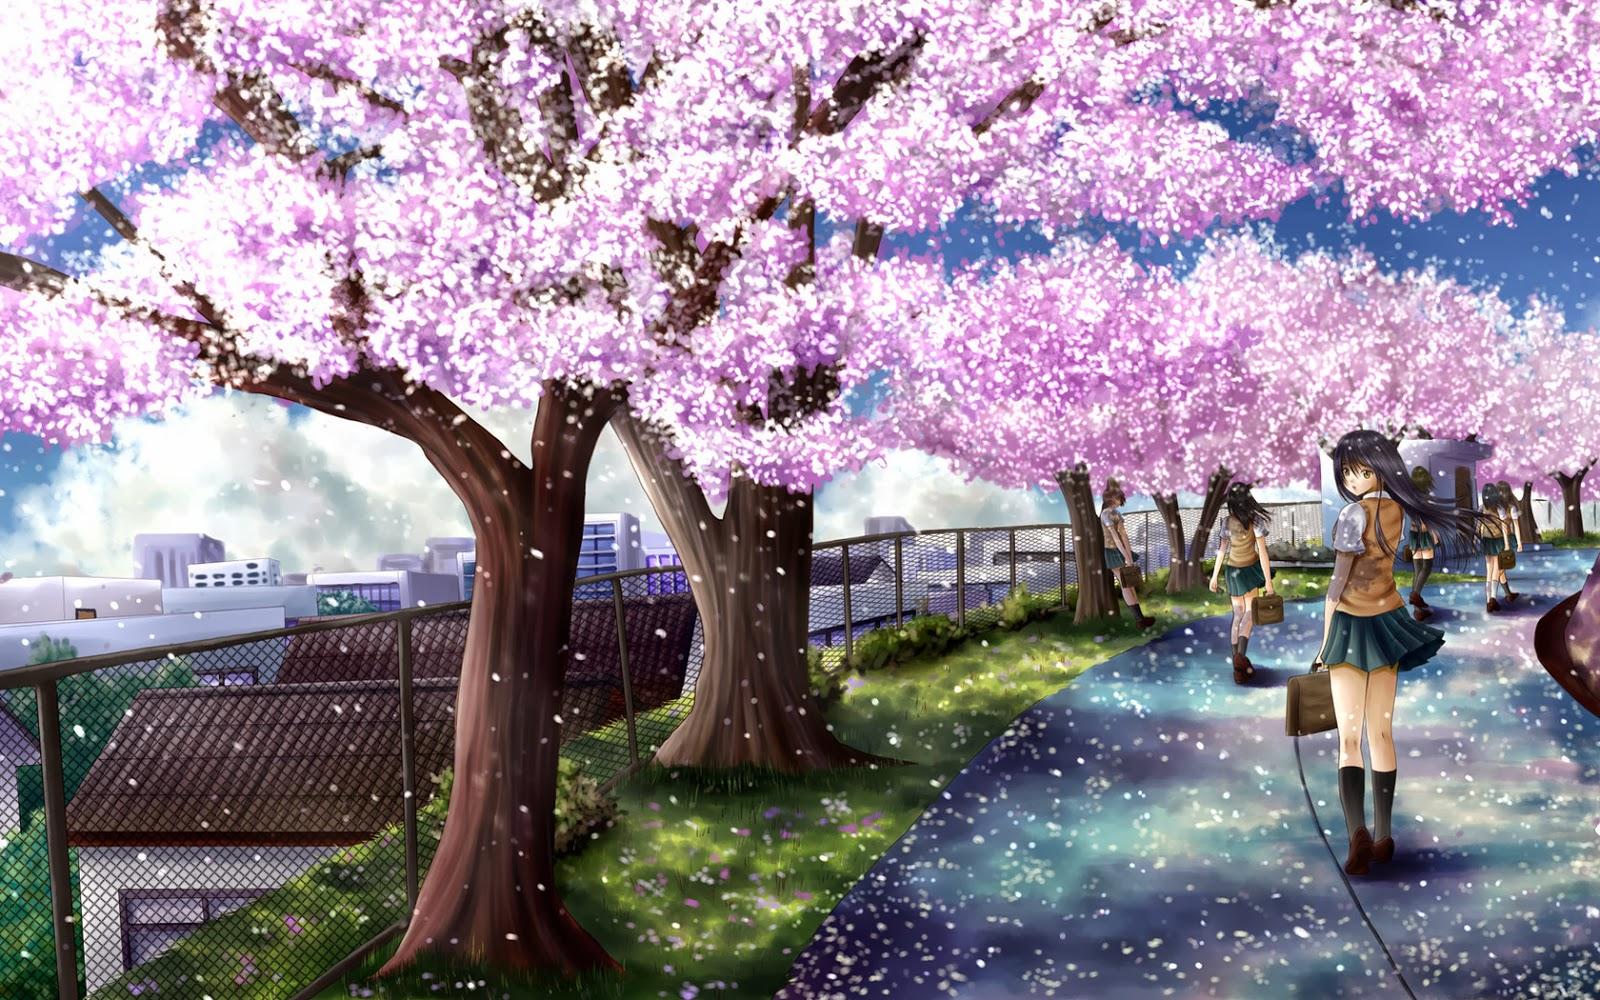 Simple Wallpaper Night Cherry Blossom - Cherry-Blossom-Tree-Wallpapers-044  2018.jpg